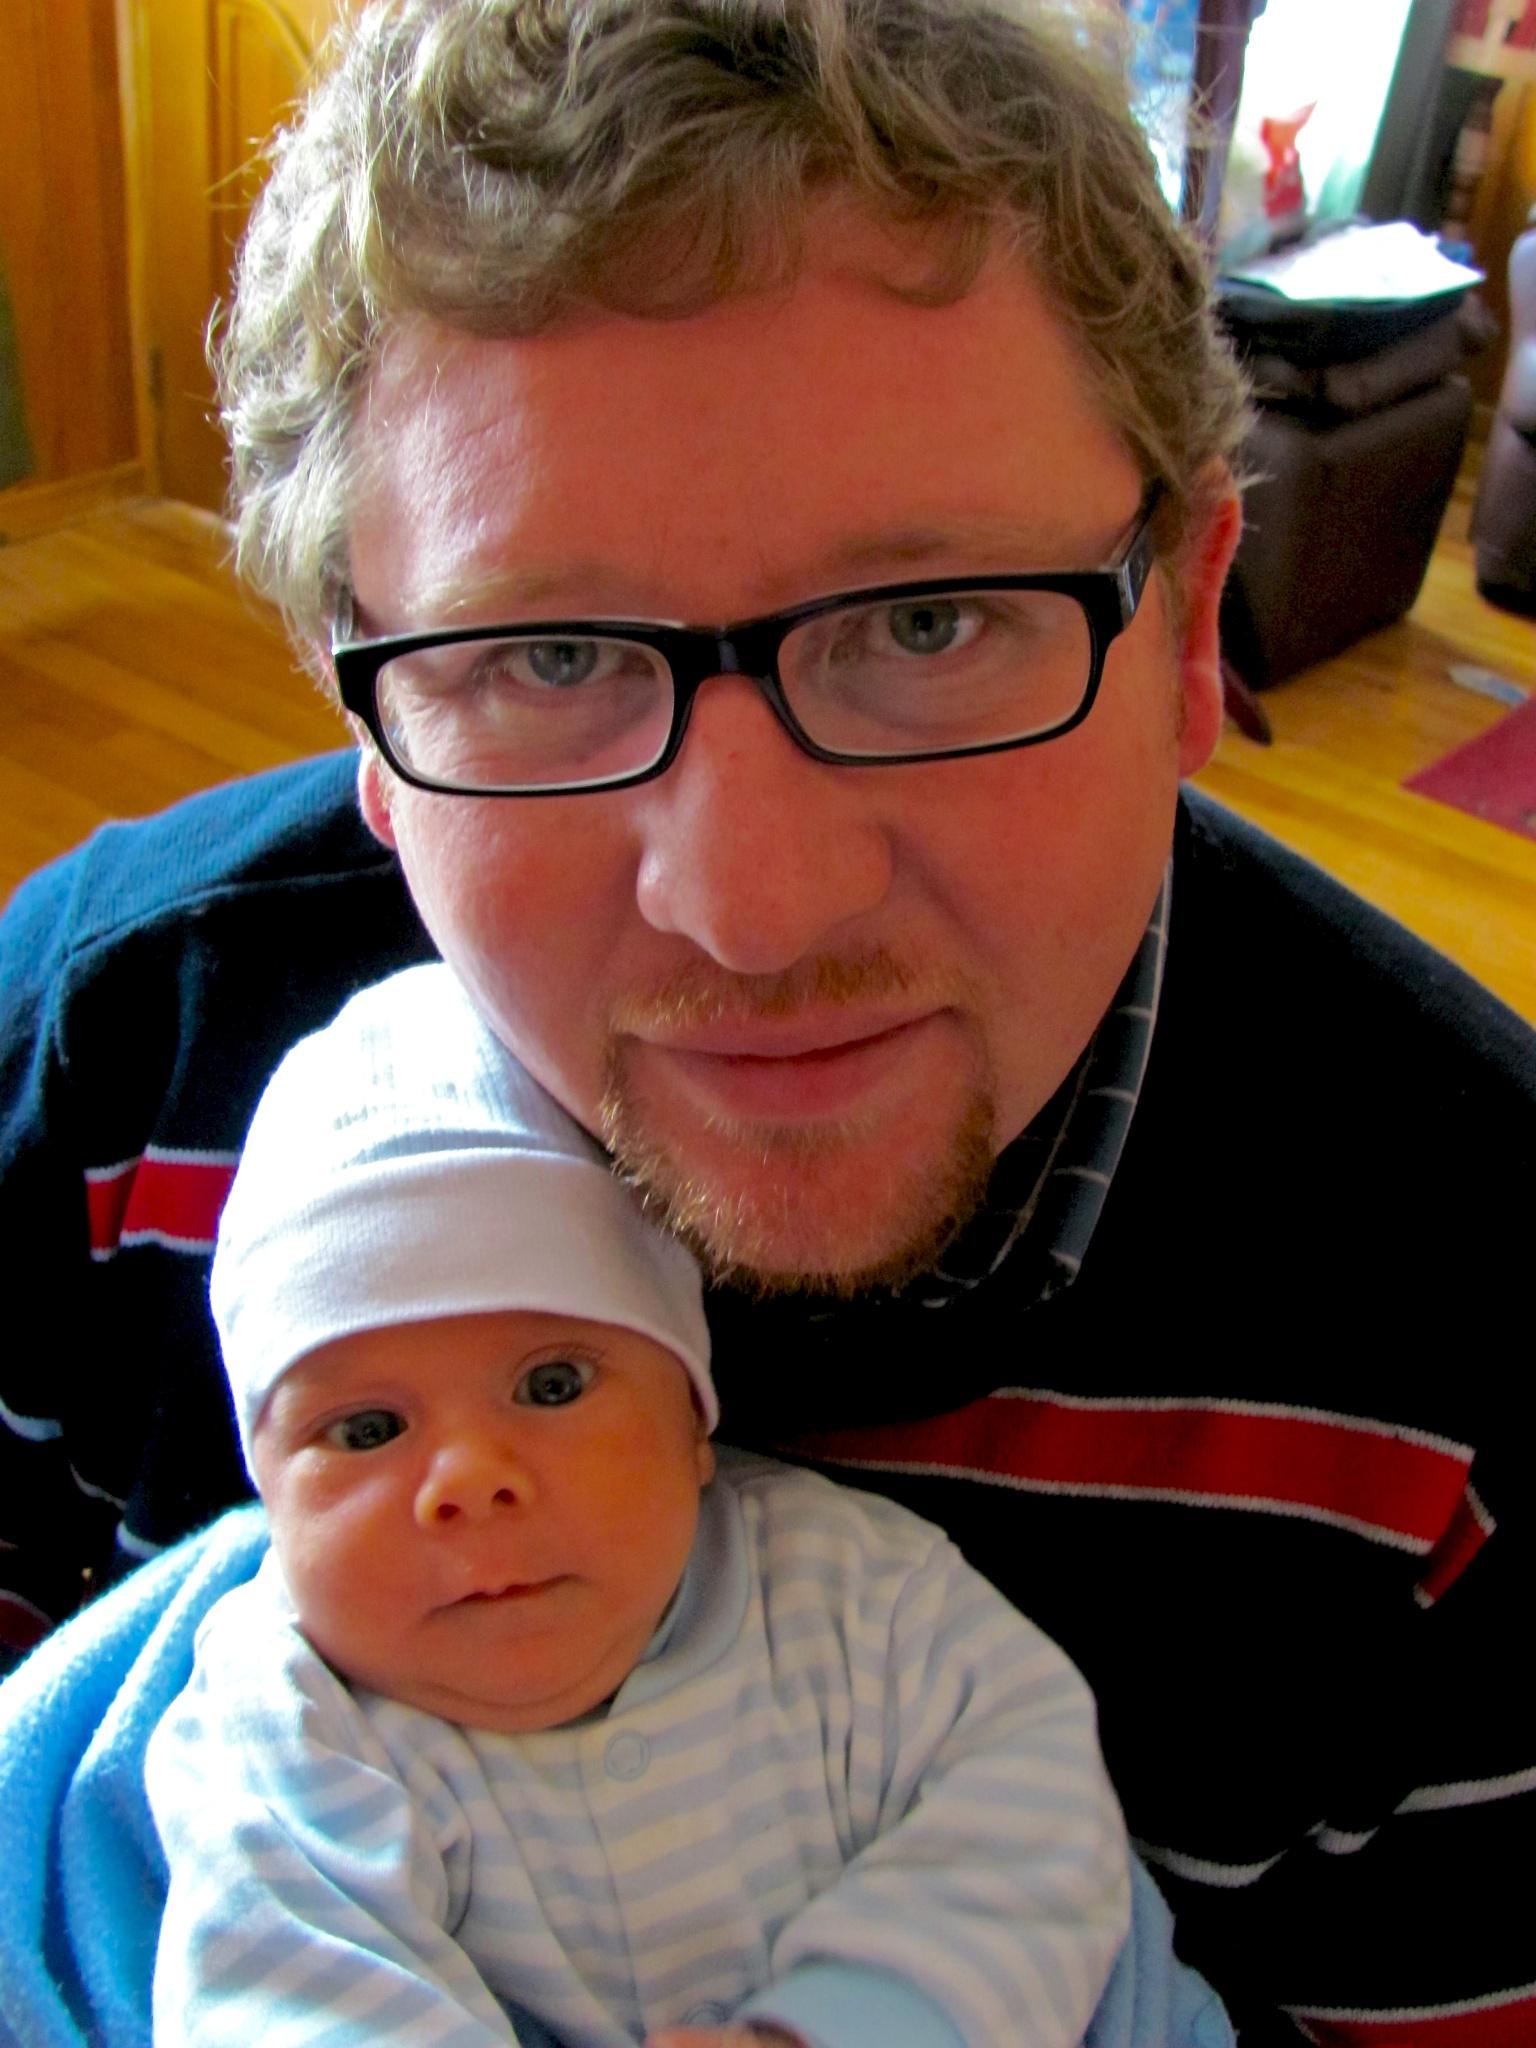 Debutando como papá hace 6 años, hoy sigo igual. by Héctor Eduardo Soto Arias